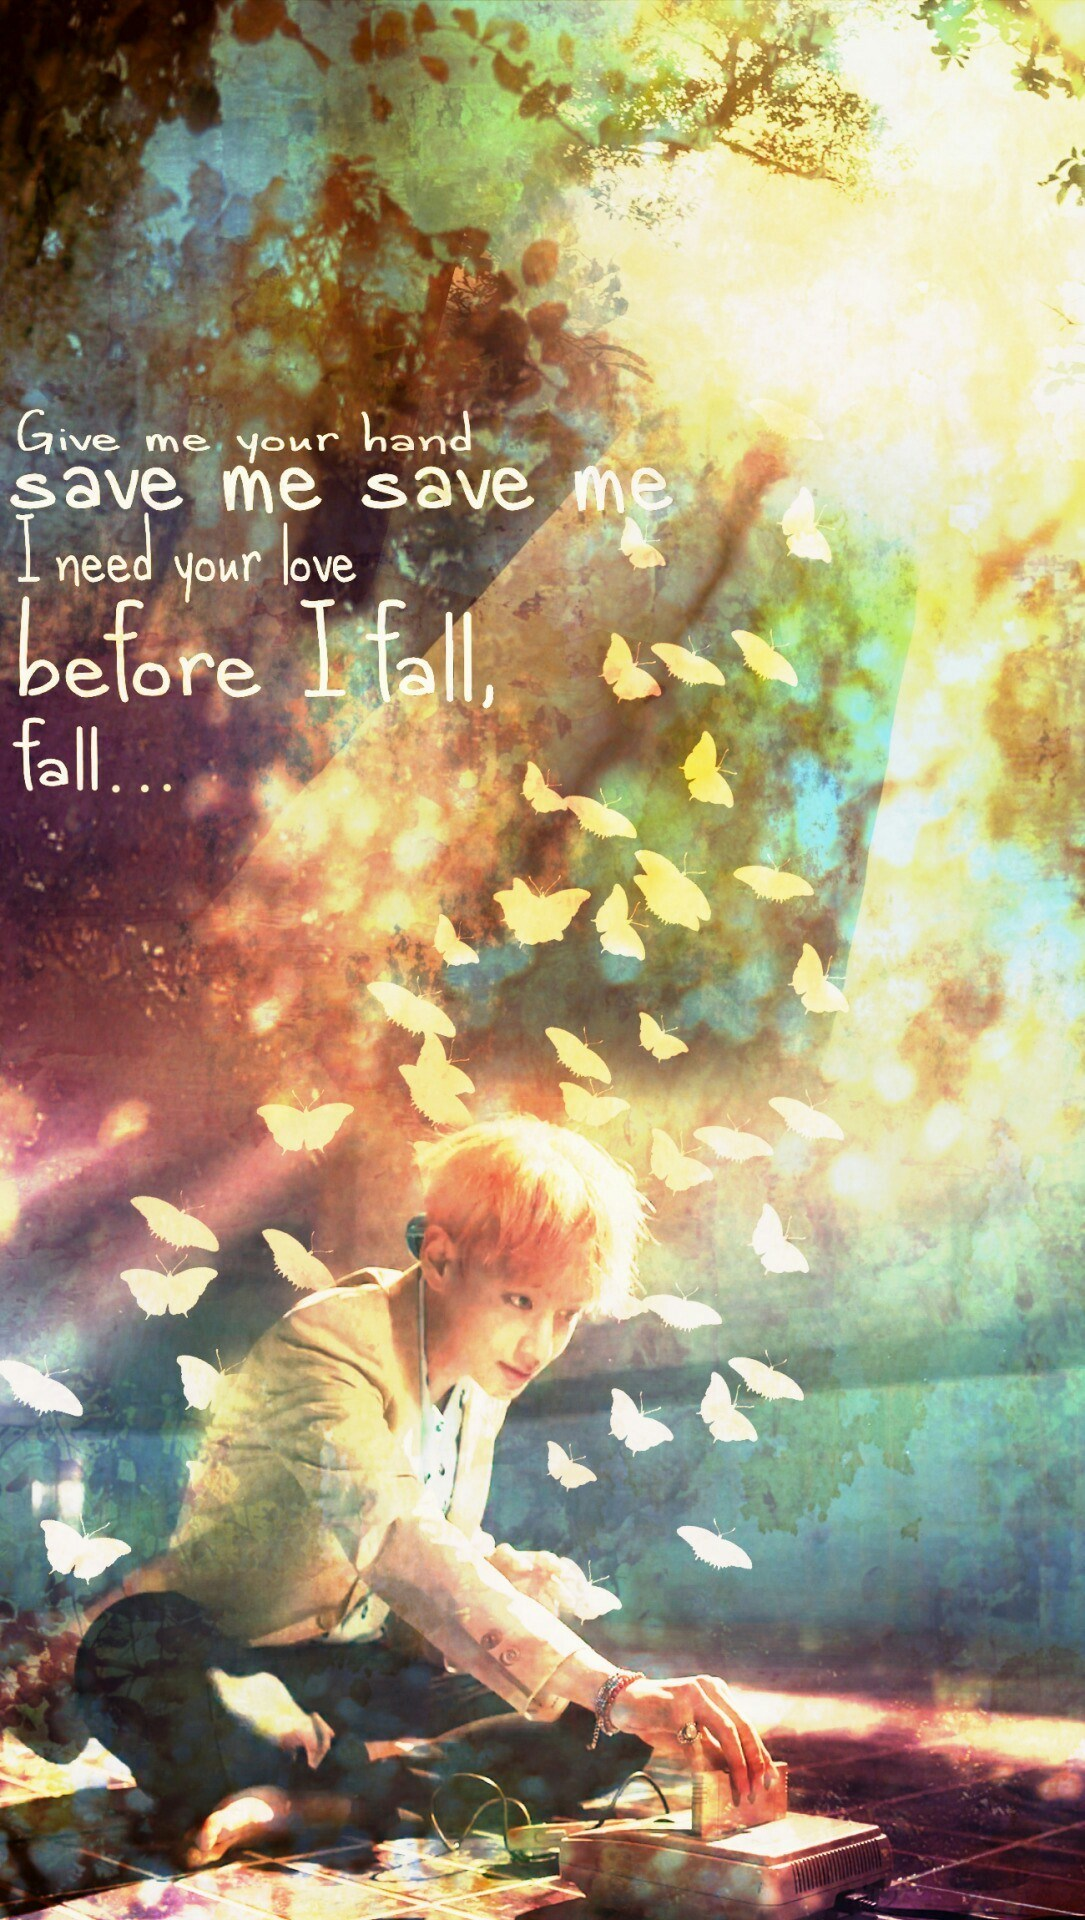 Bts Quote Desktop Wallpaper Bts Aesthetic Wallpaper Lyrics